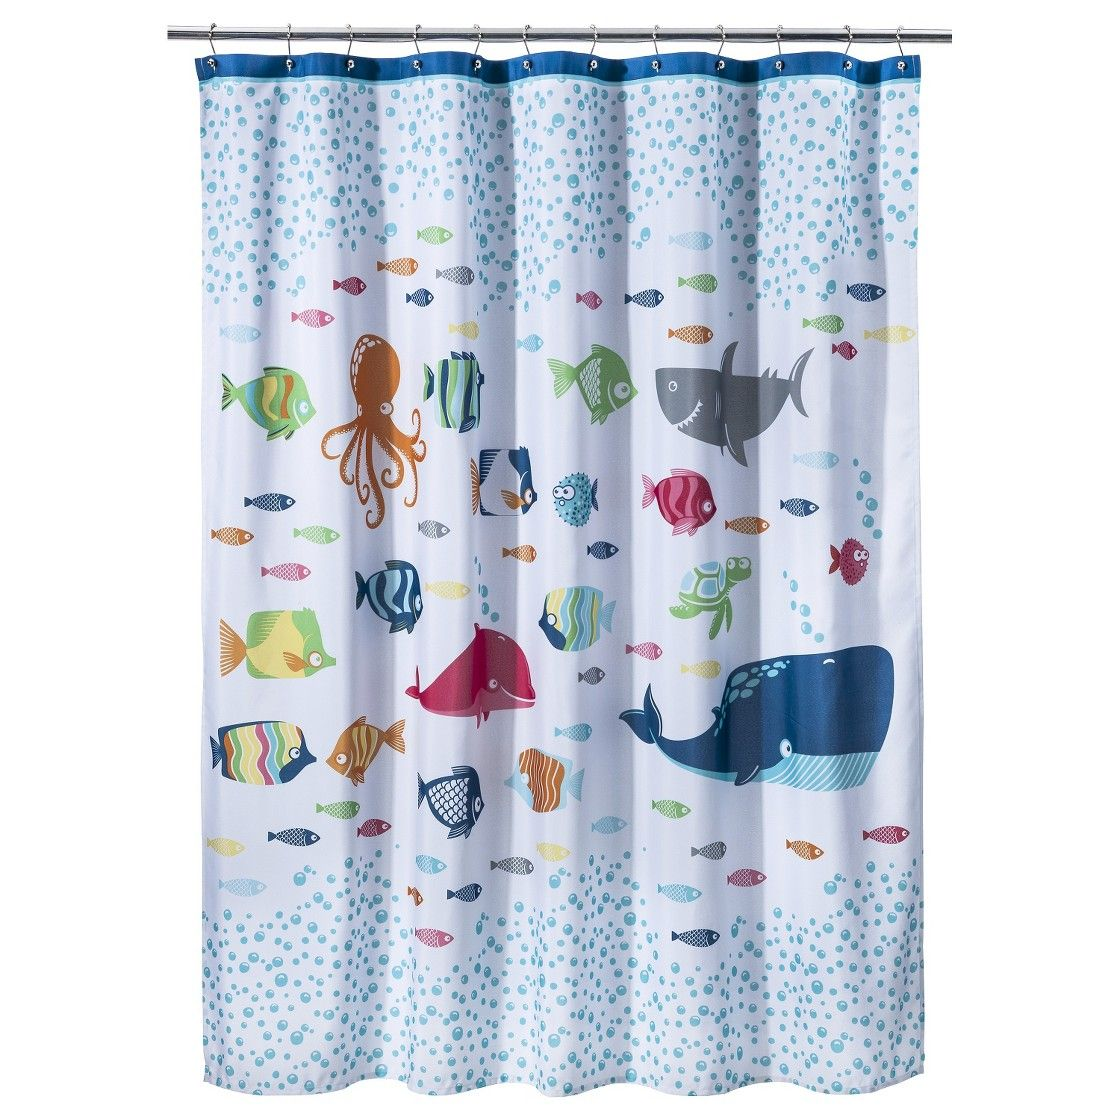 Circo Fish Shower Curtain Kids Shower Curtain Bathroom Kids